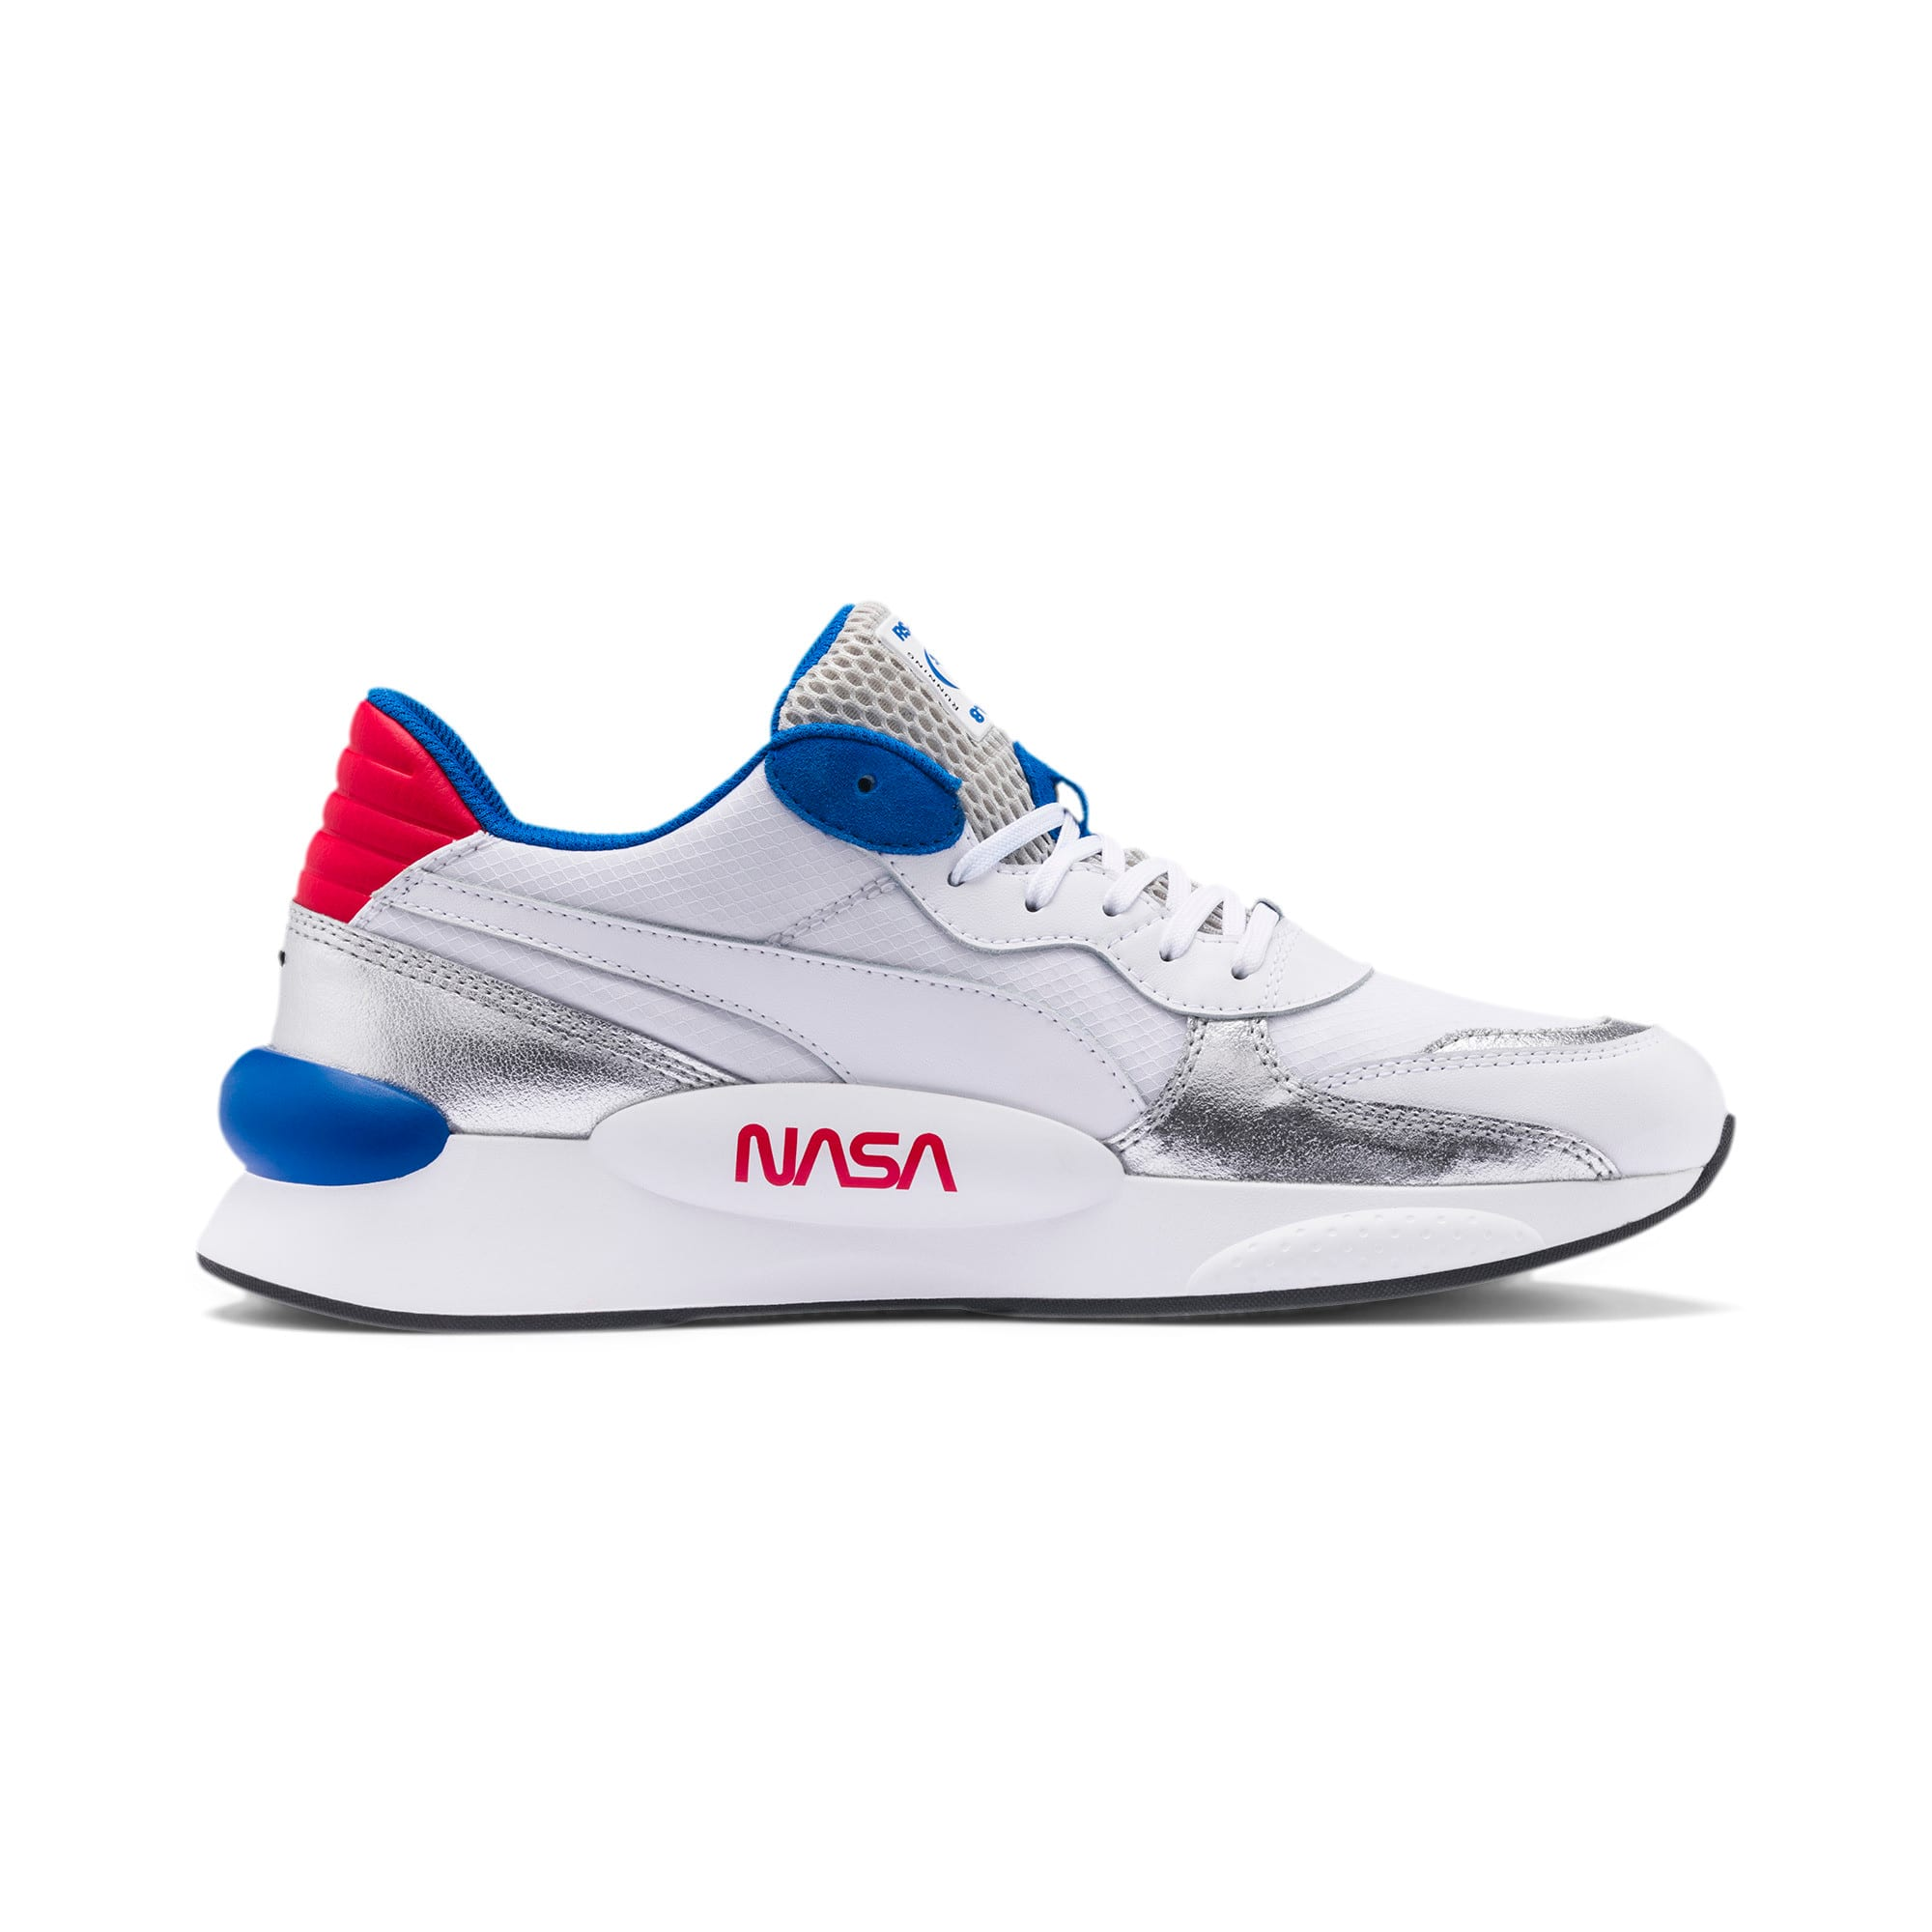 Thumbnail 5 of RS 9.8 Space Agency Sneakers, Puma White-Puma Silver, medium